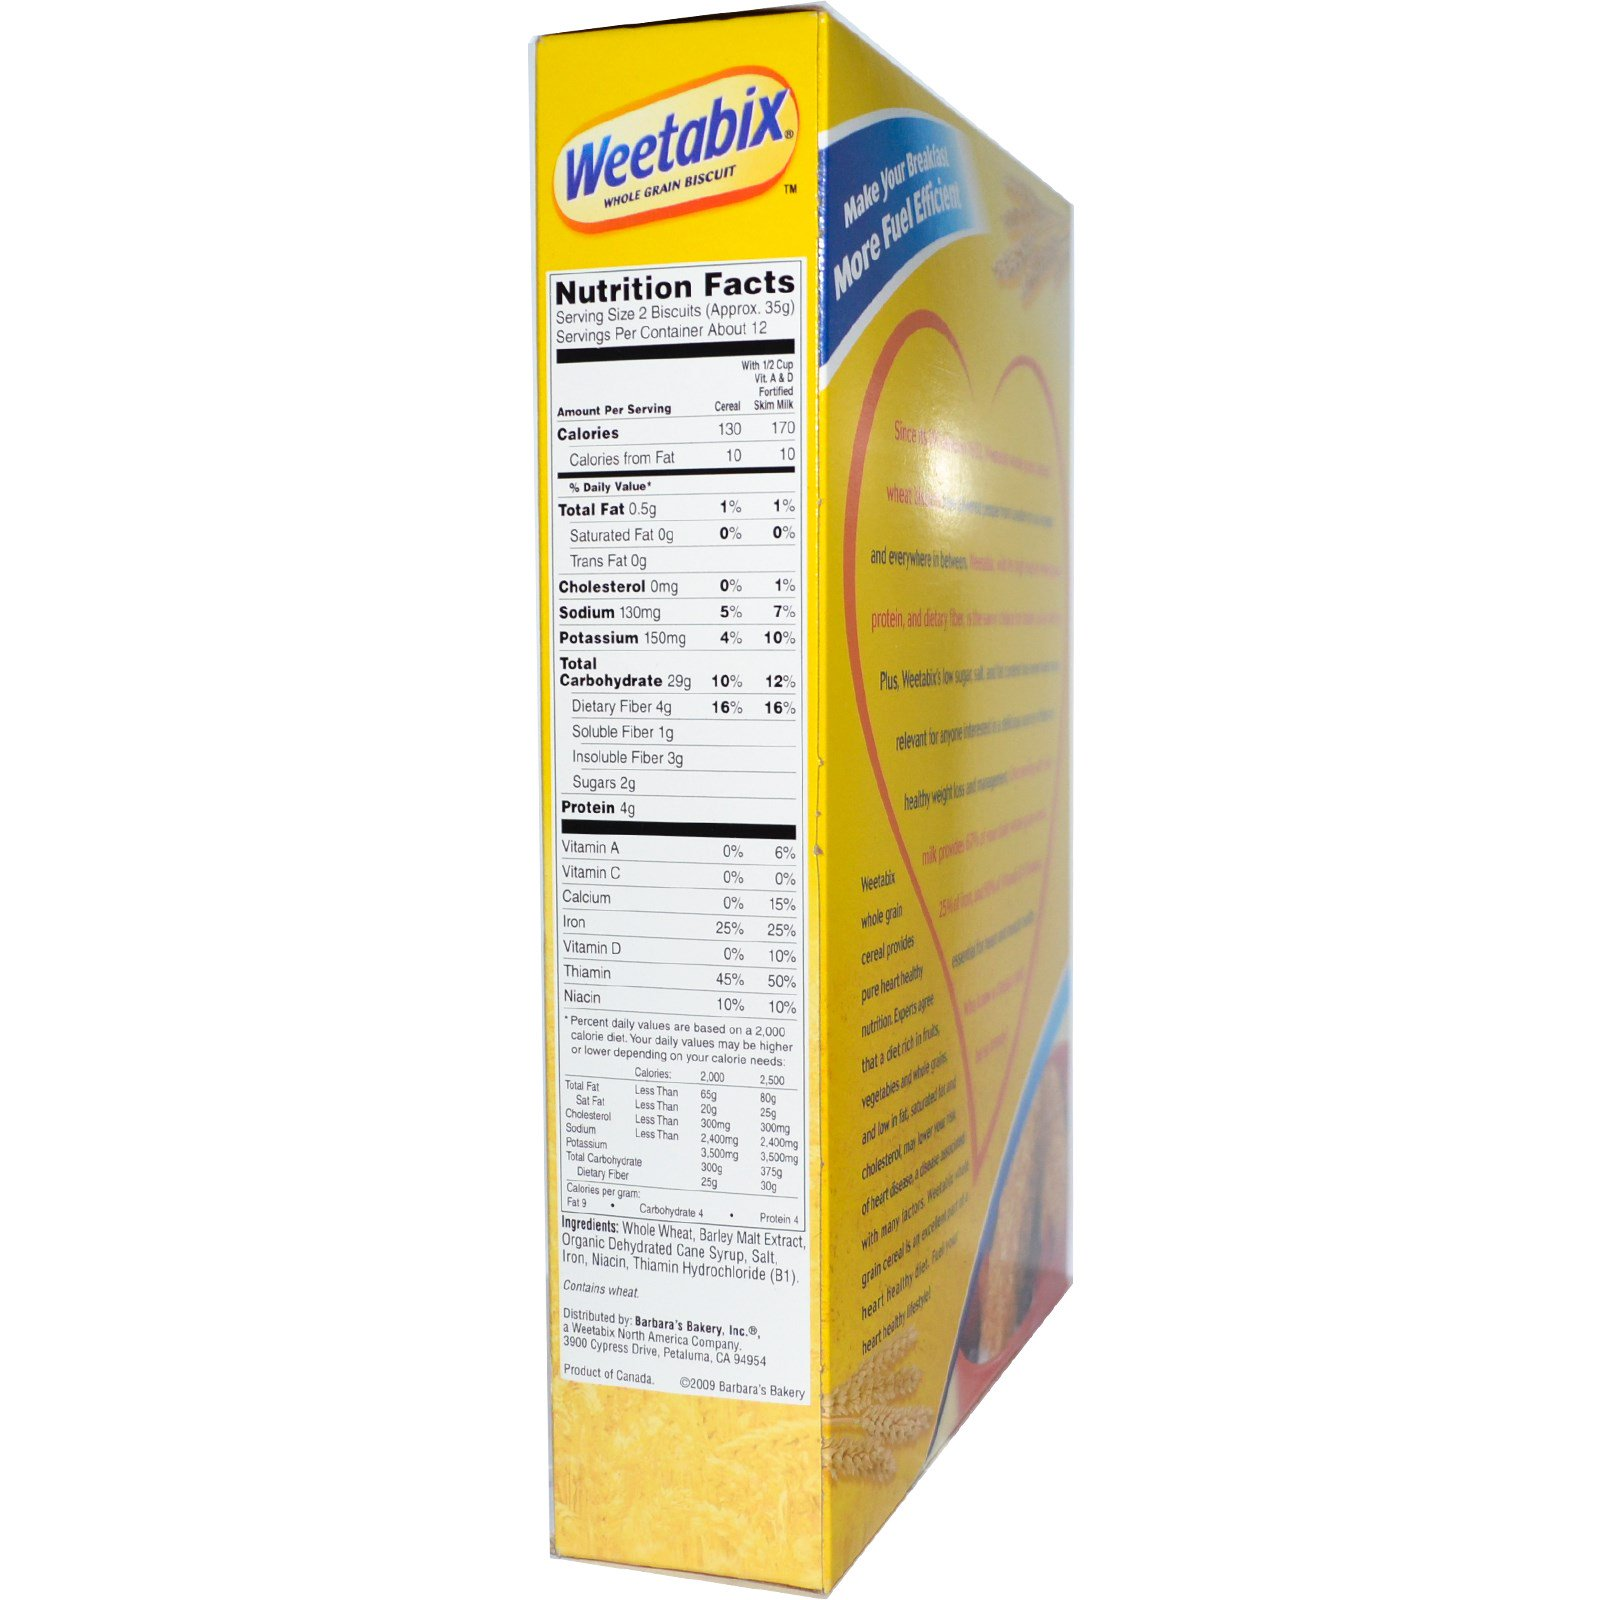 Weetabix nutrition label